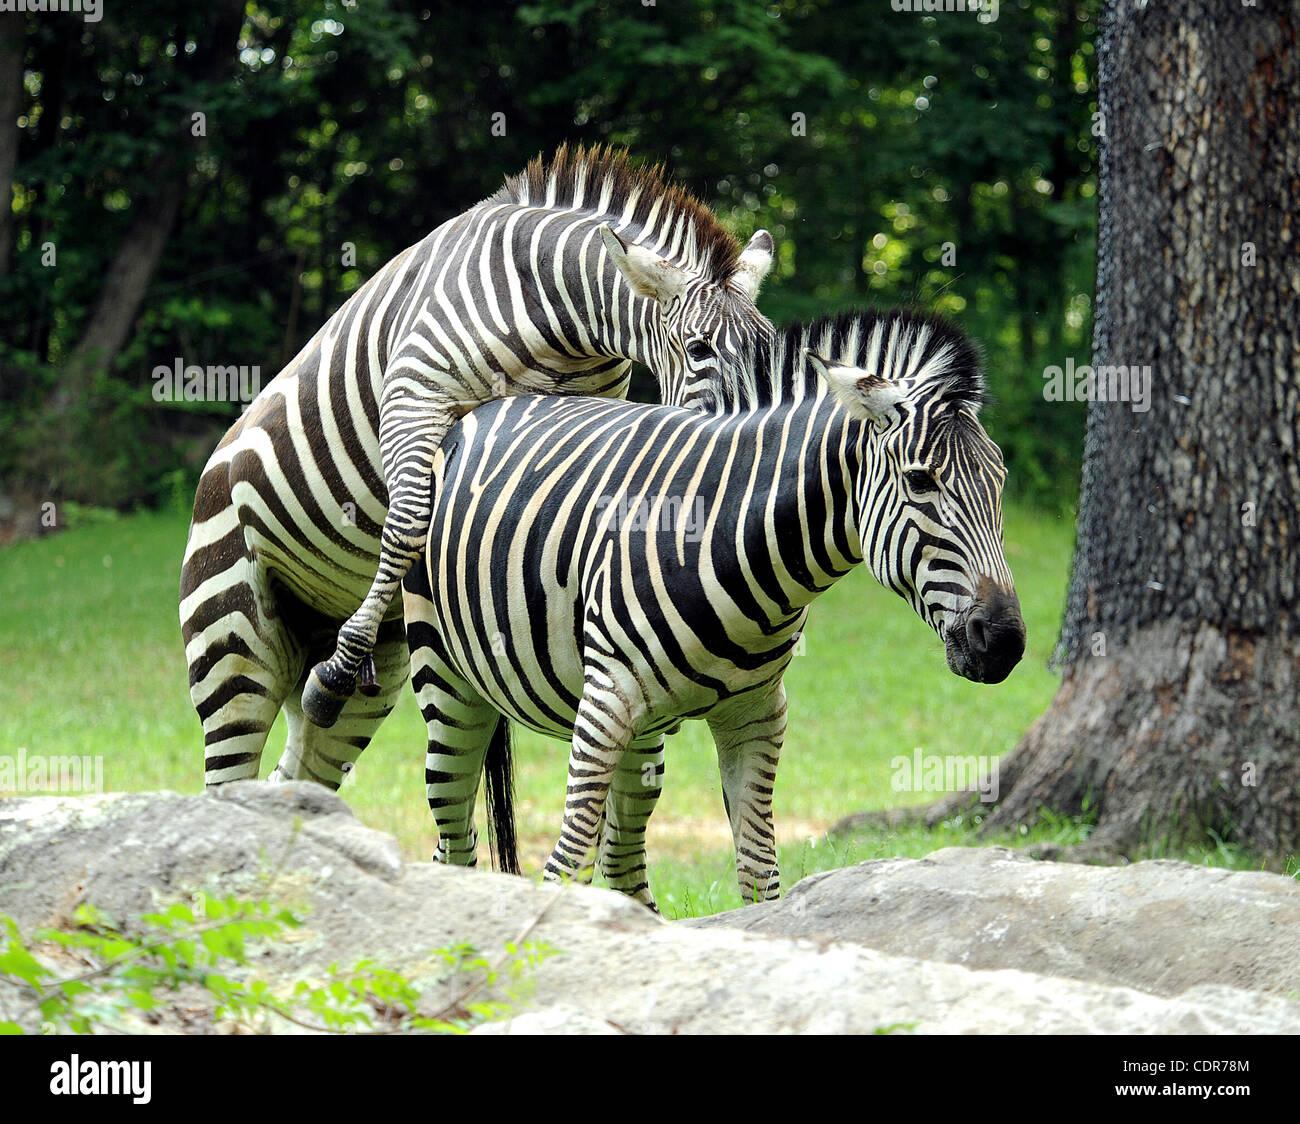 Zebras mating - photo#29